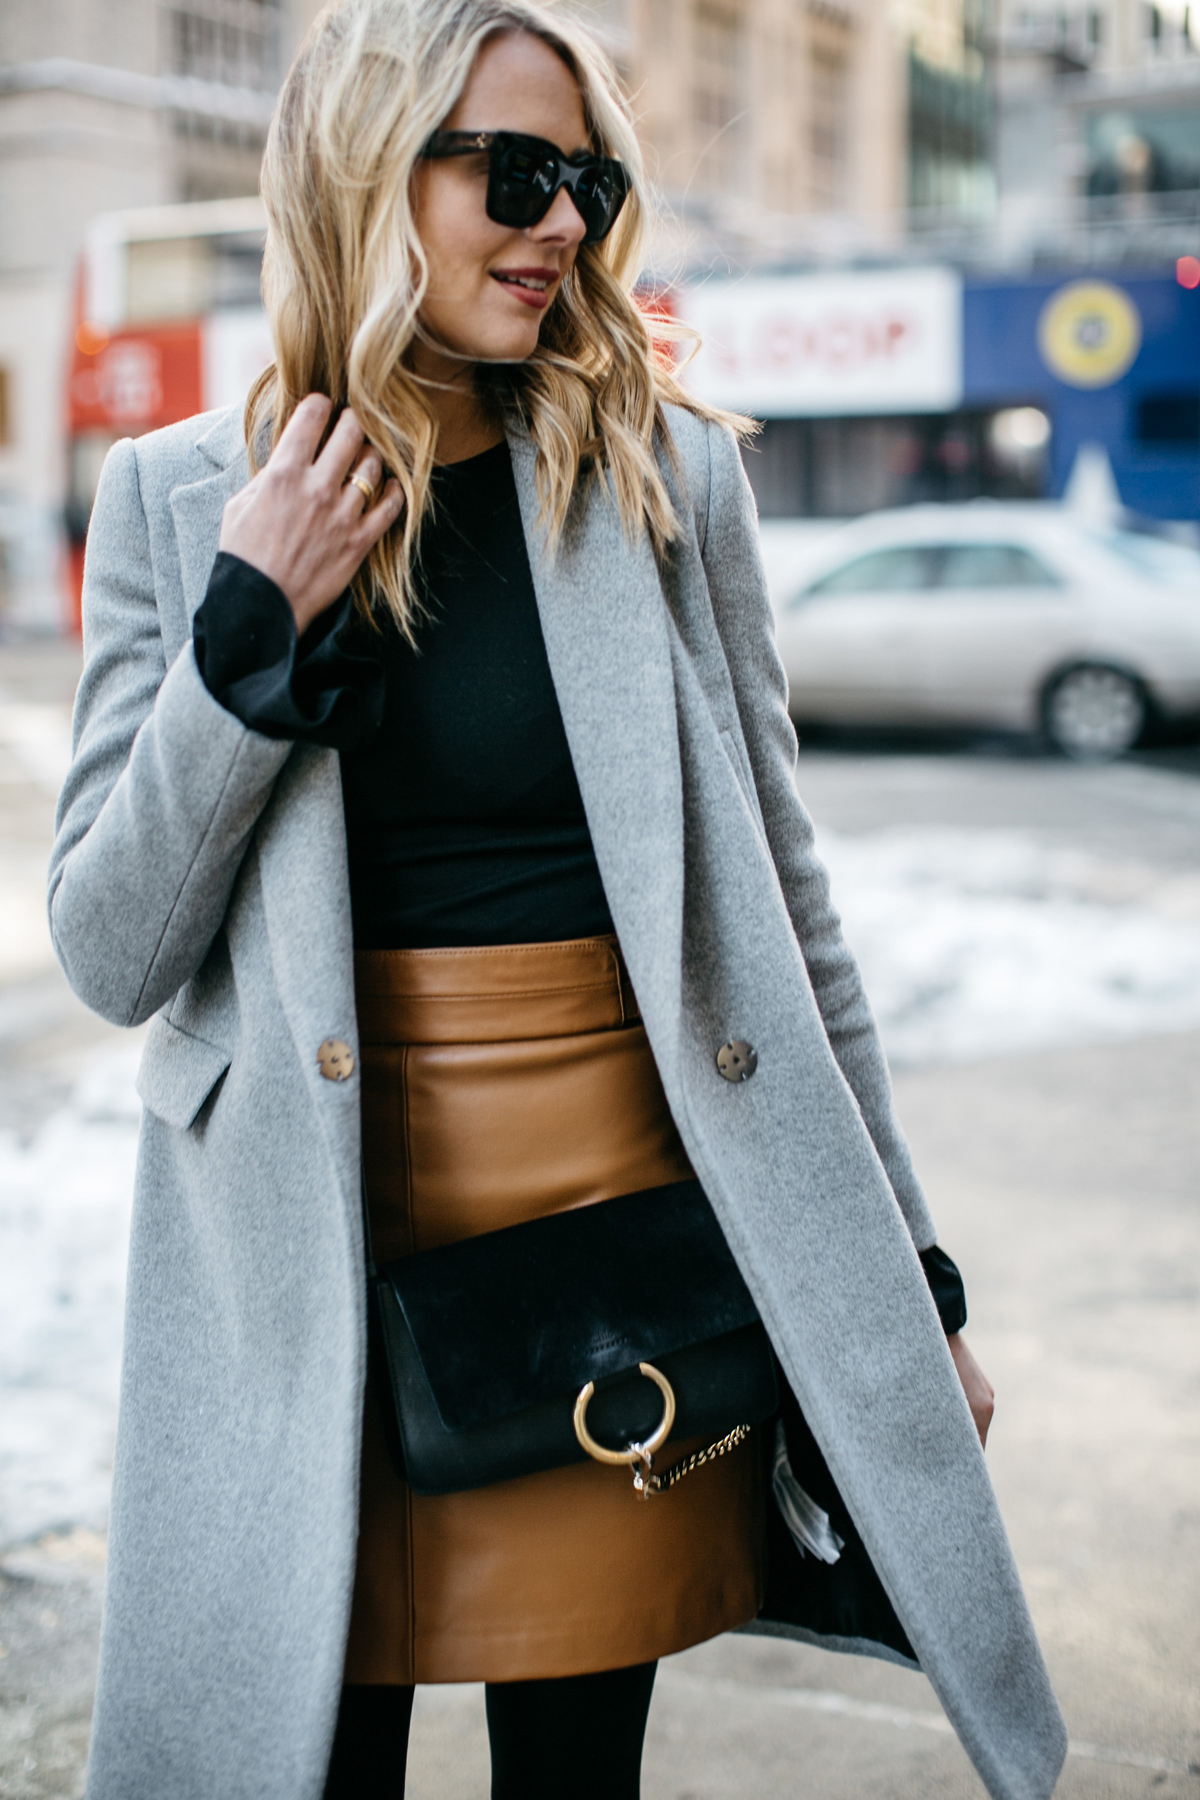 NYFW Street Style, Grey Coat, Tan Skirt, Chloe Faye Handbag, Black Booties